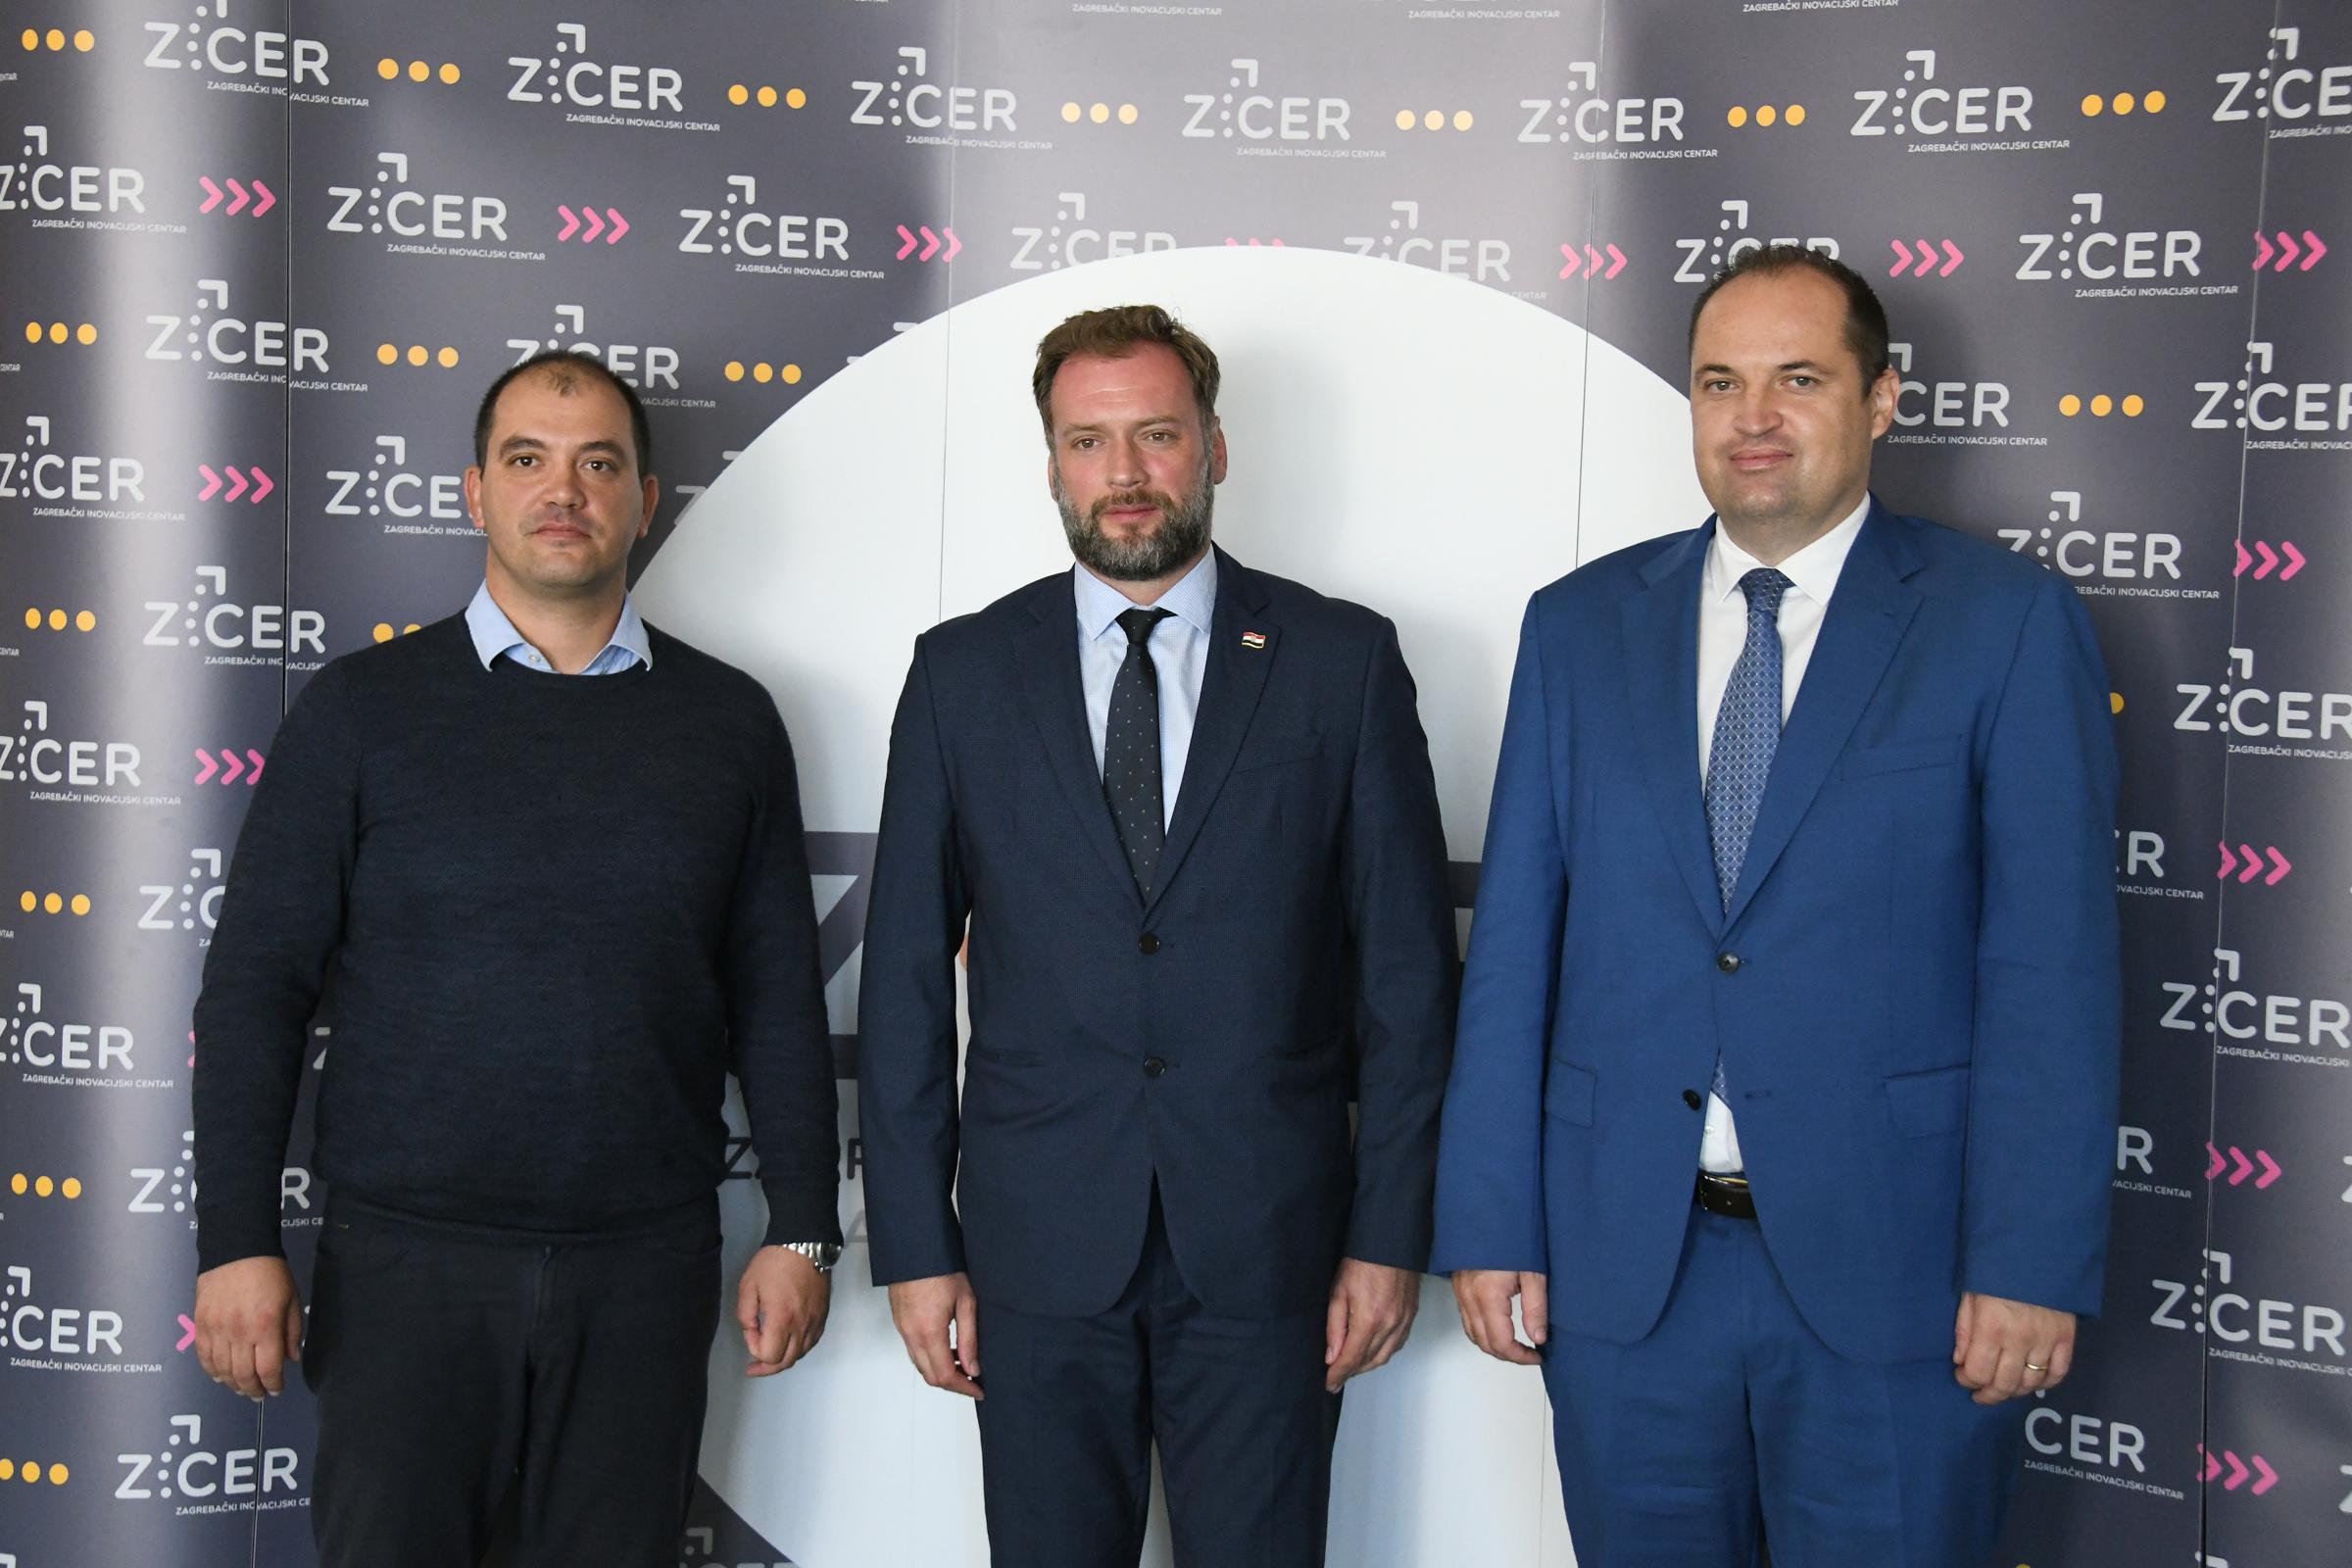 Ministar Banožić na Skupštini klastera obrambene industrije